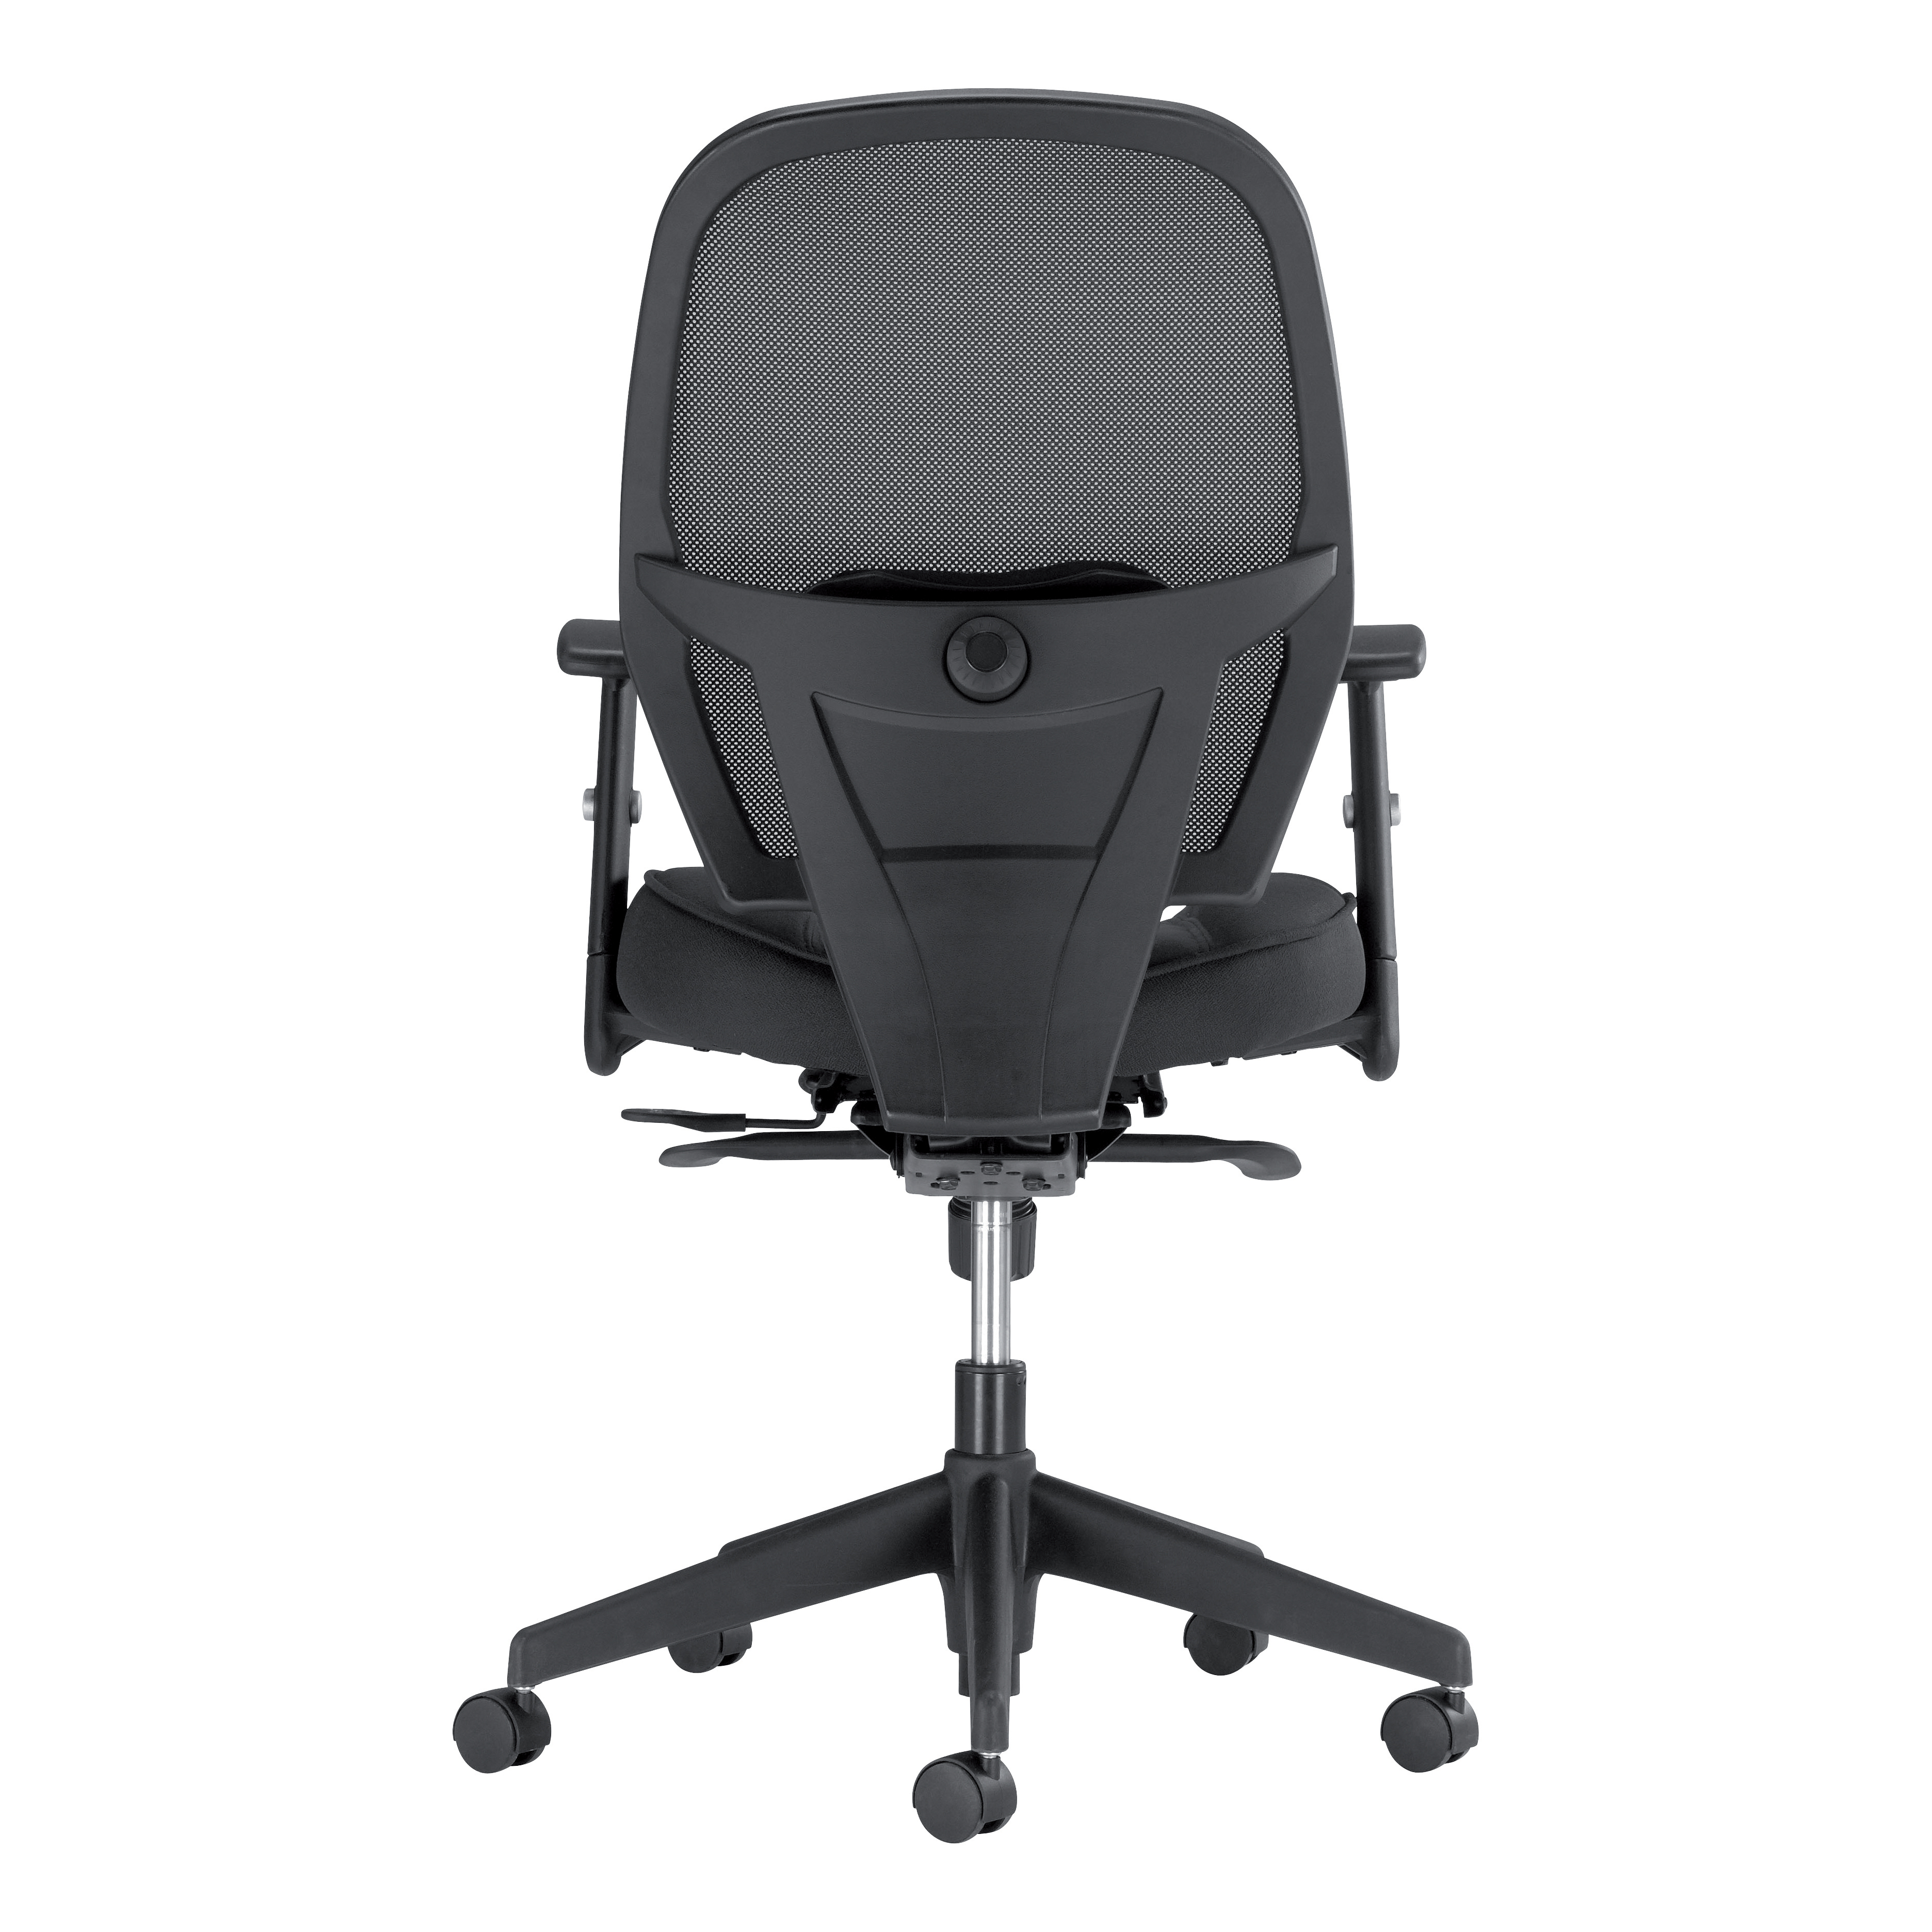 Trexus Amaze Synchronous Mesh Chair Black 520x520x470-600mm Ref 11186-02Black